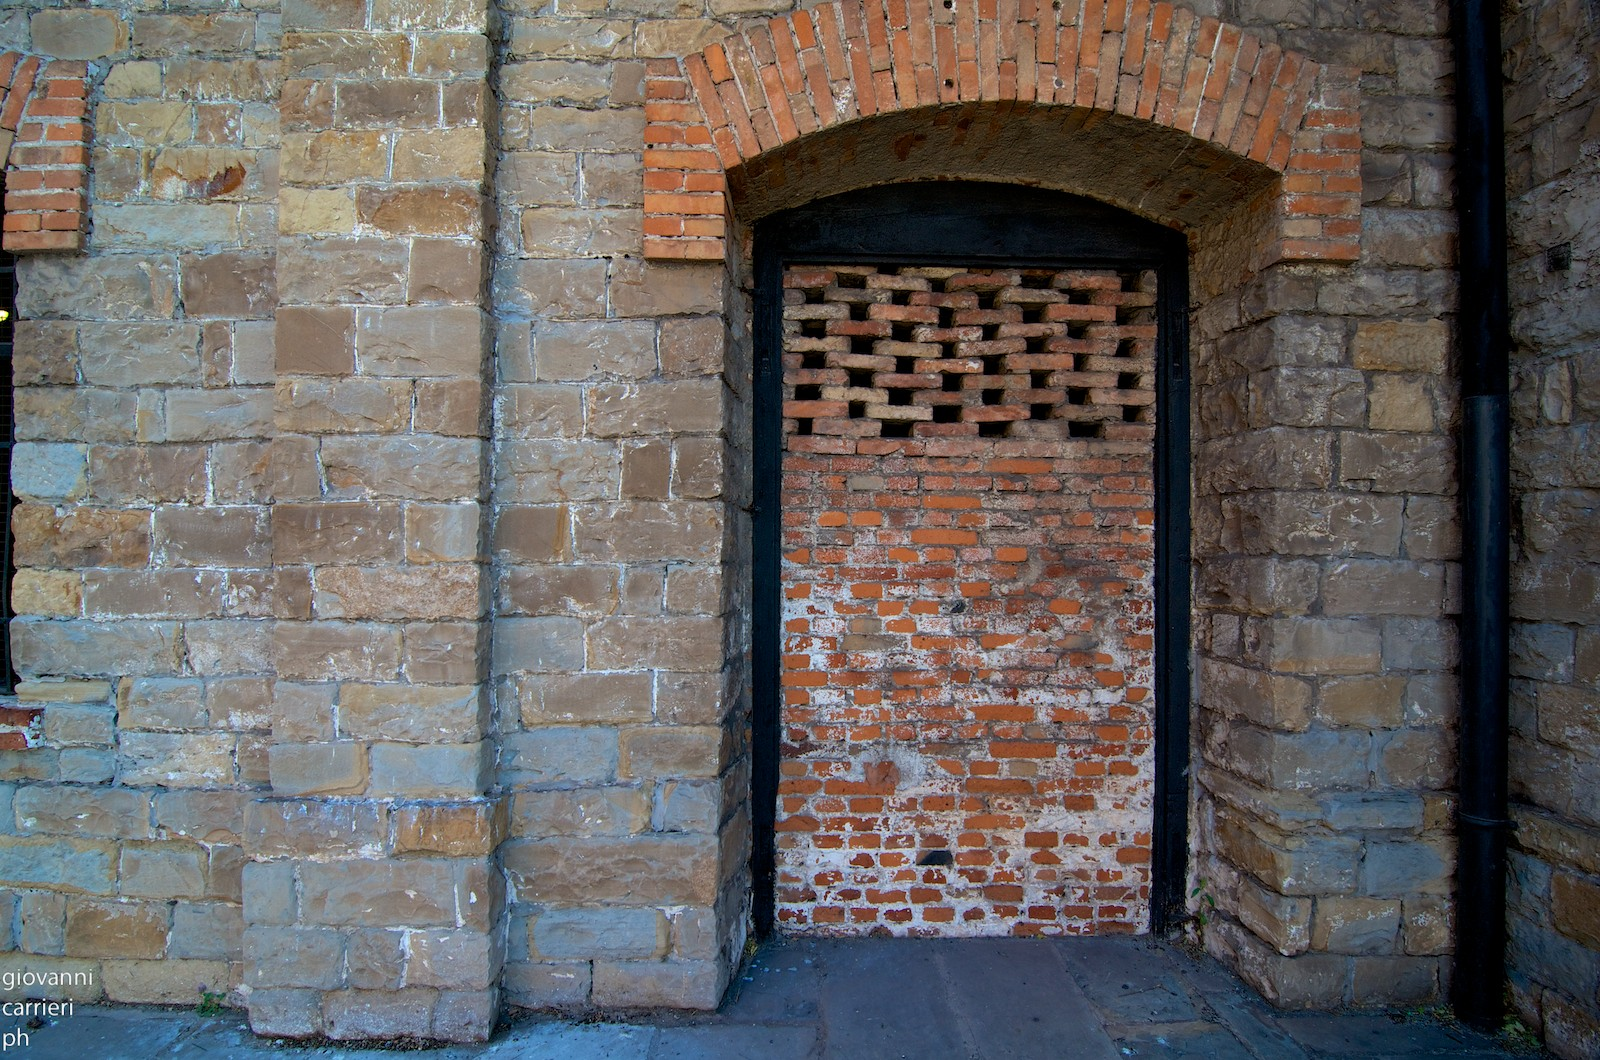 Le finestre murate